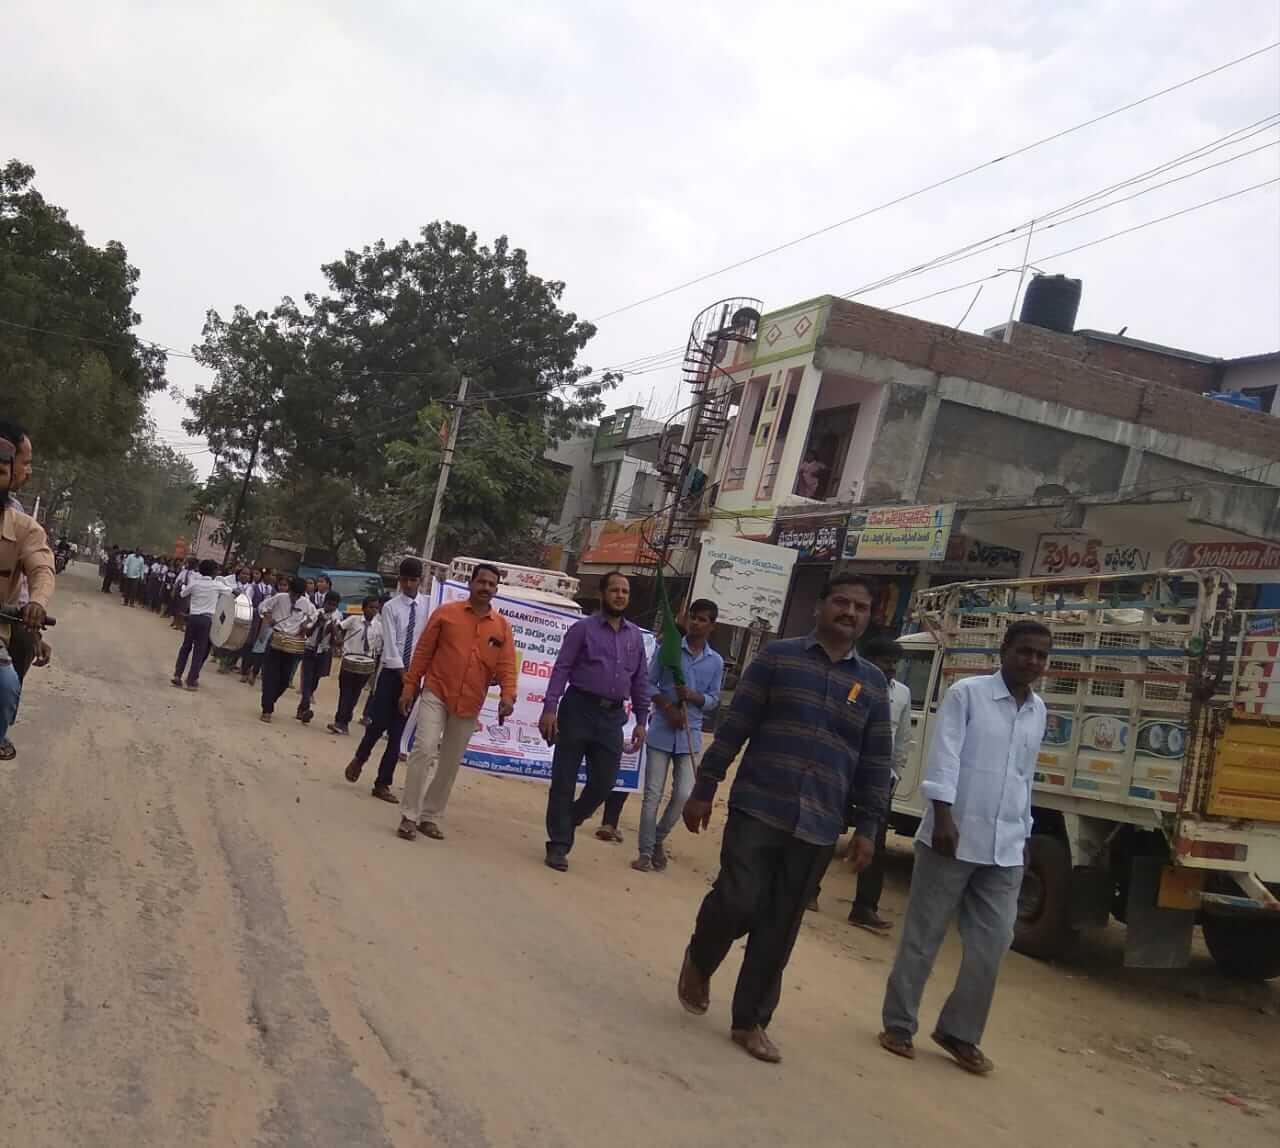 Swach bharath in telkapally